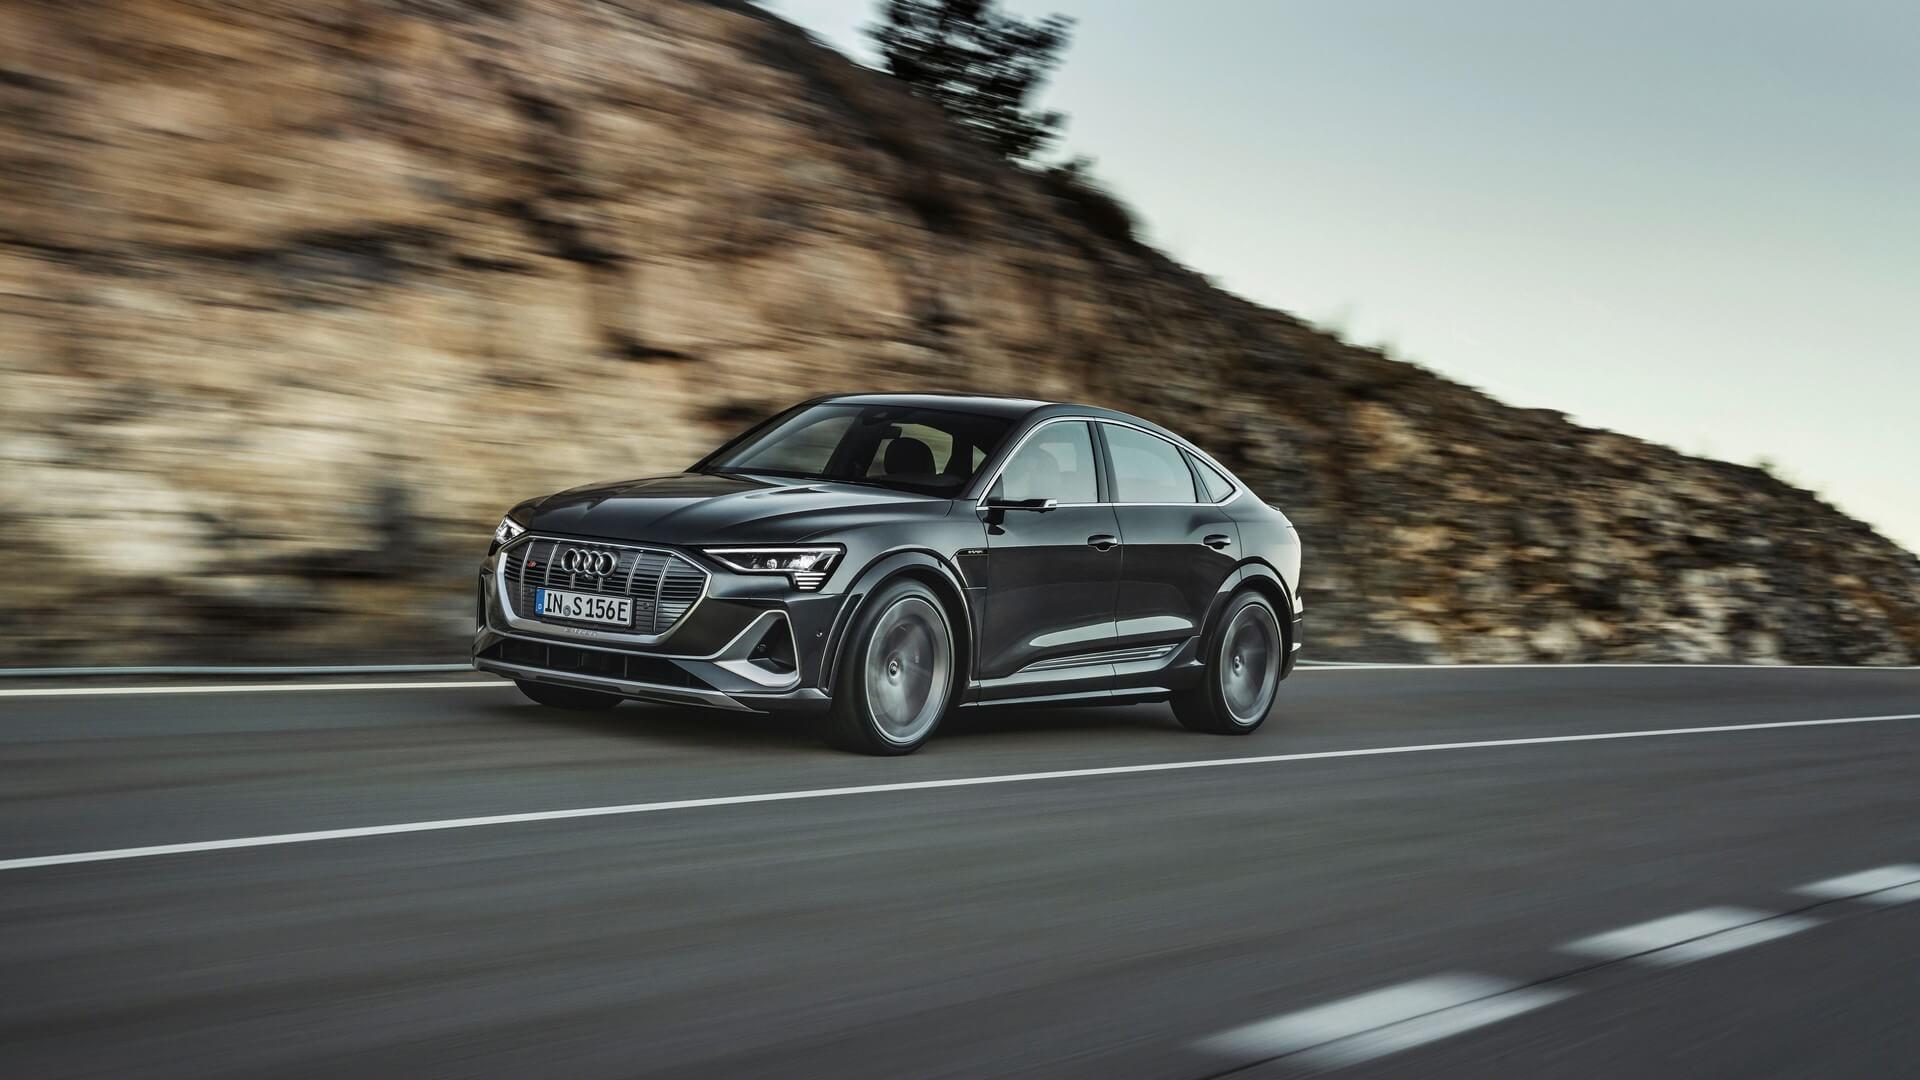 Audi-E-Tron-S-and-E-Tron-S-Sportback-2020-44